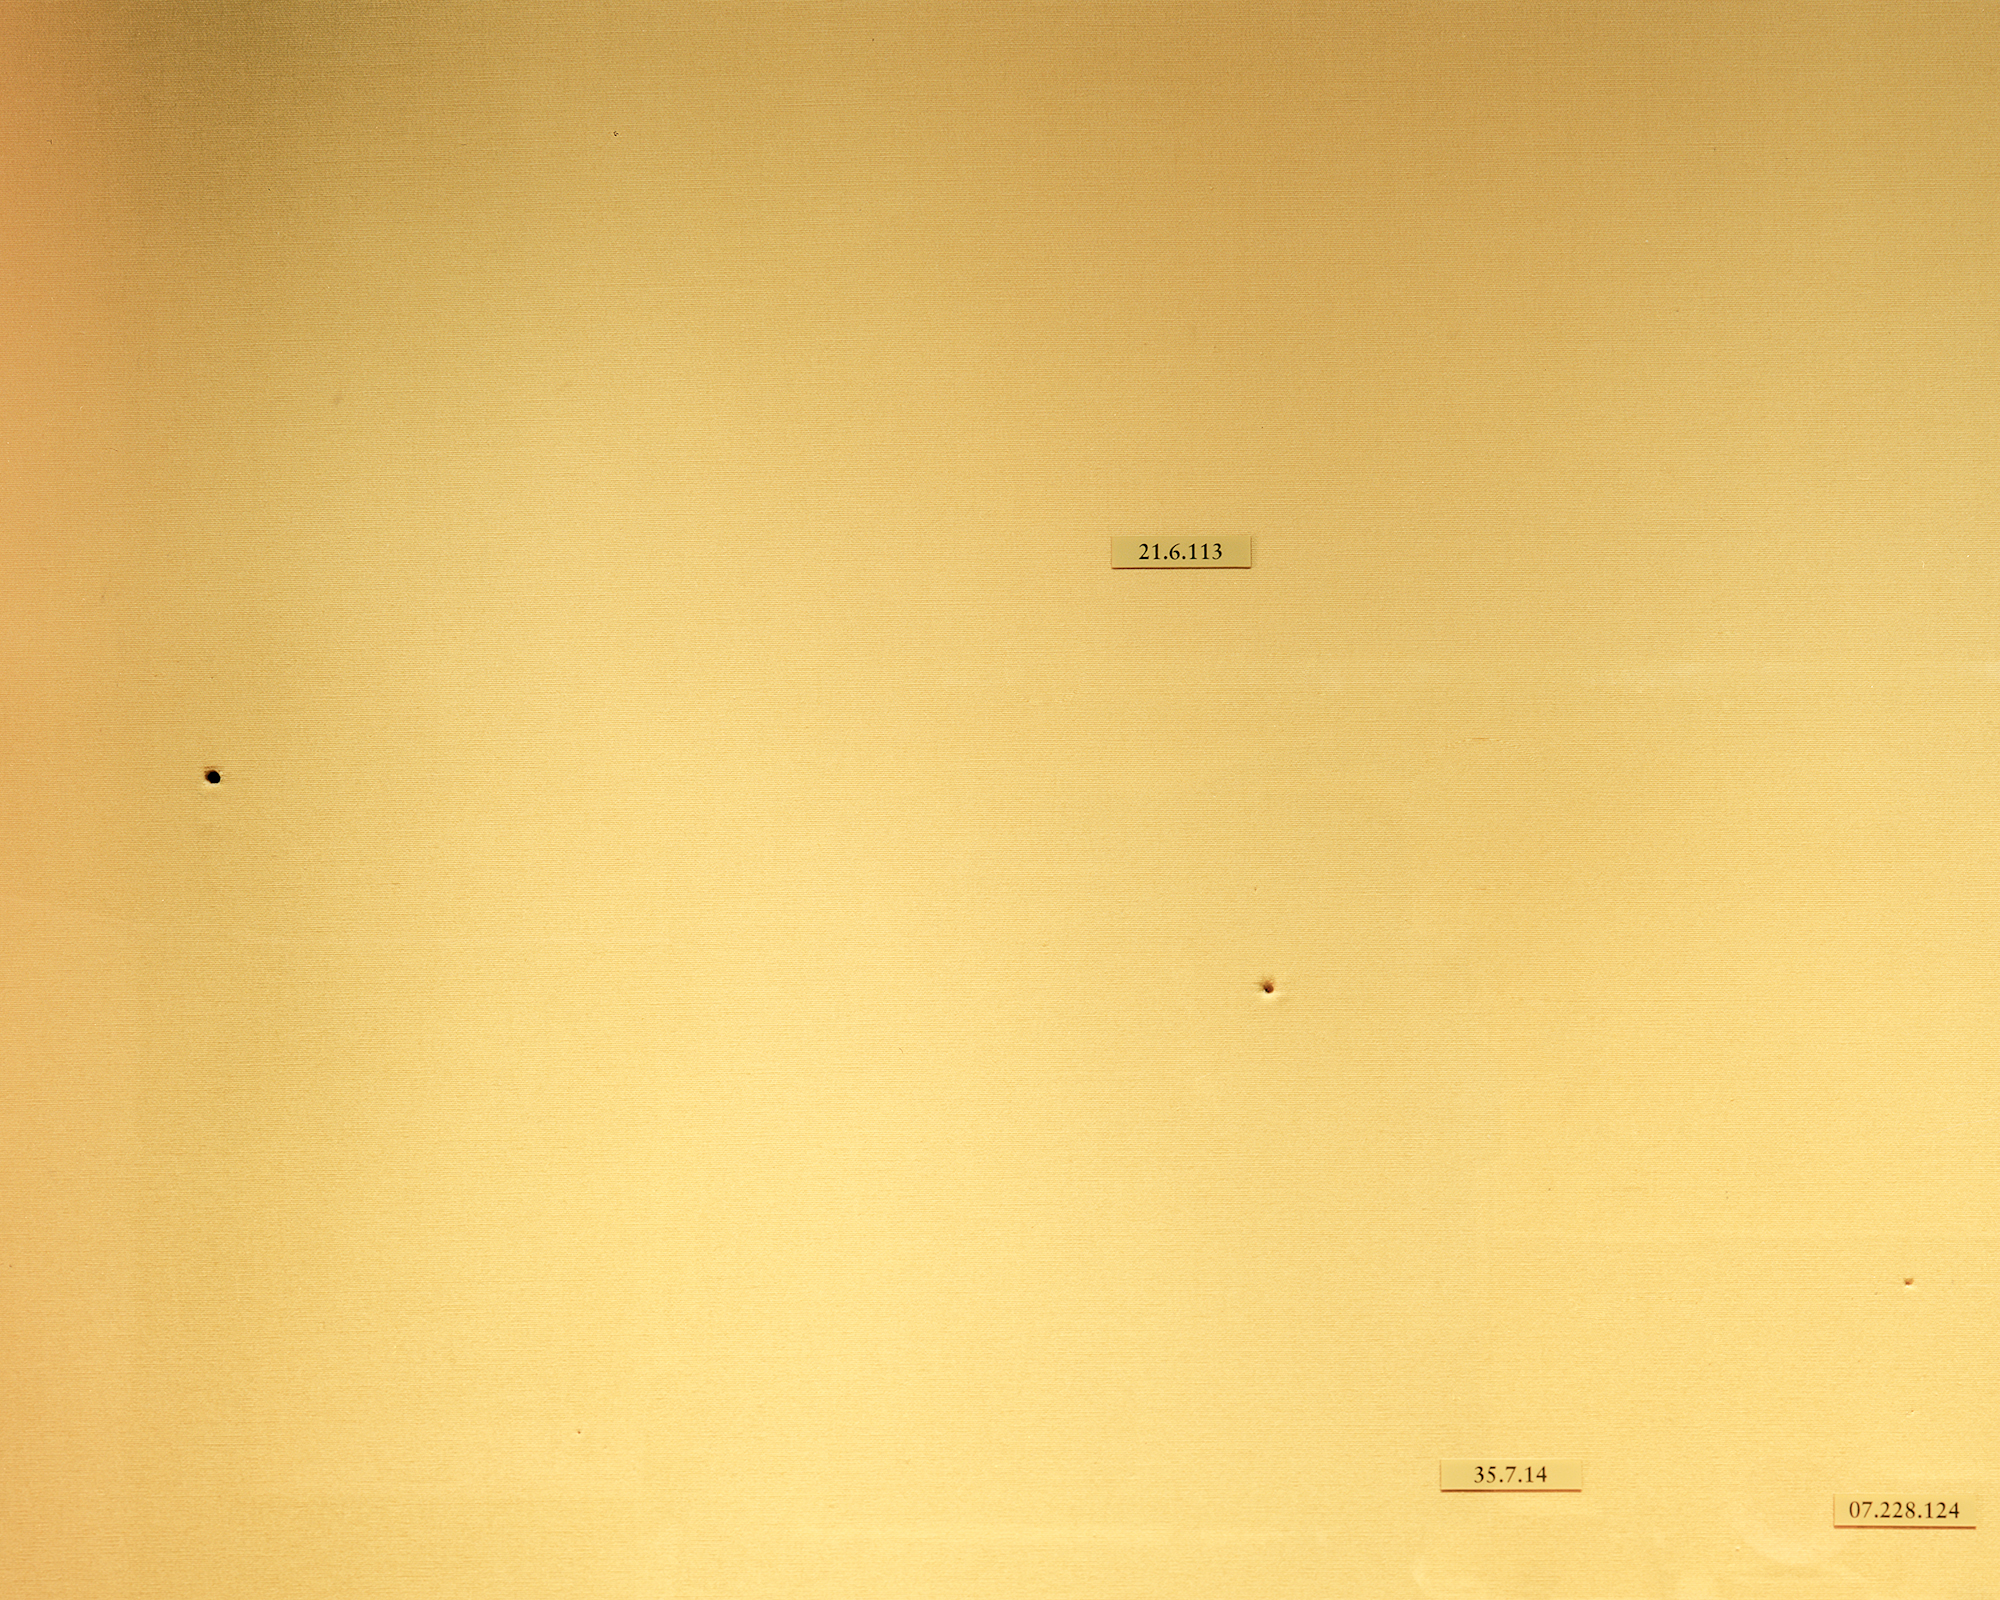 The Metropolitan Museum of Art-2, archival pigment print,11 x 14 inches, 2013